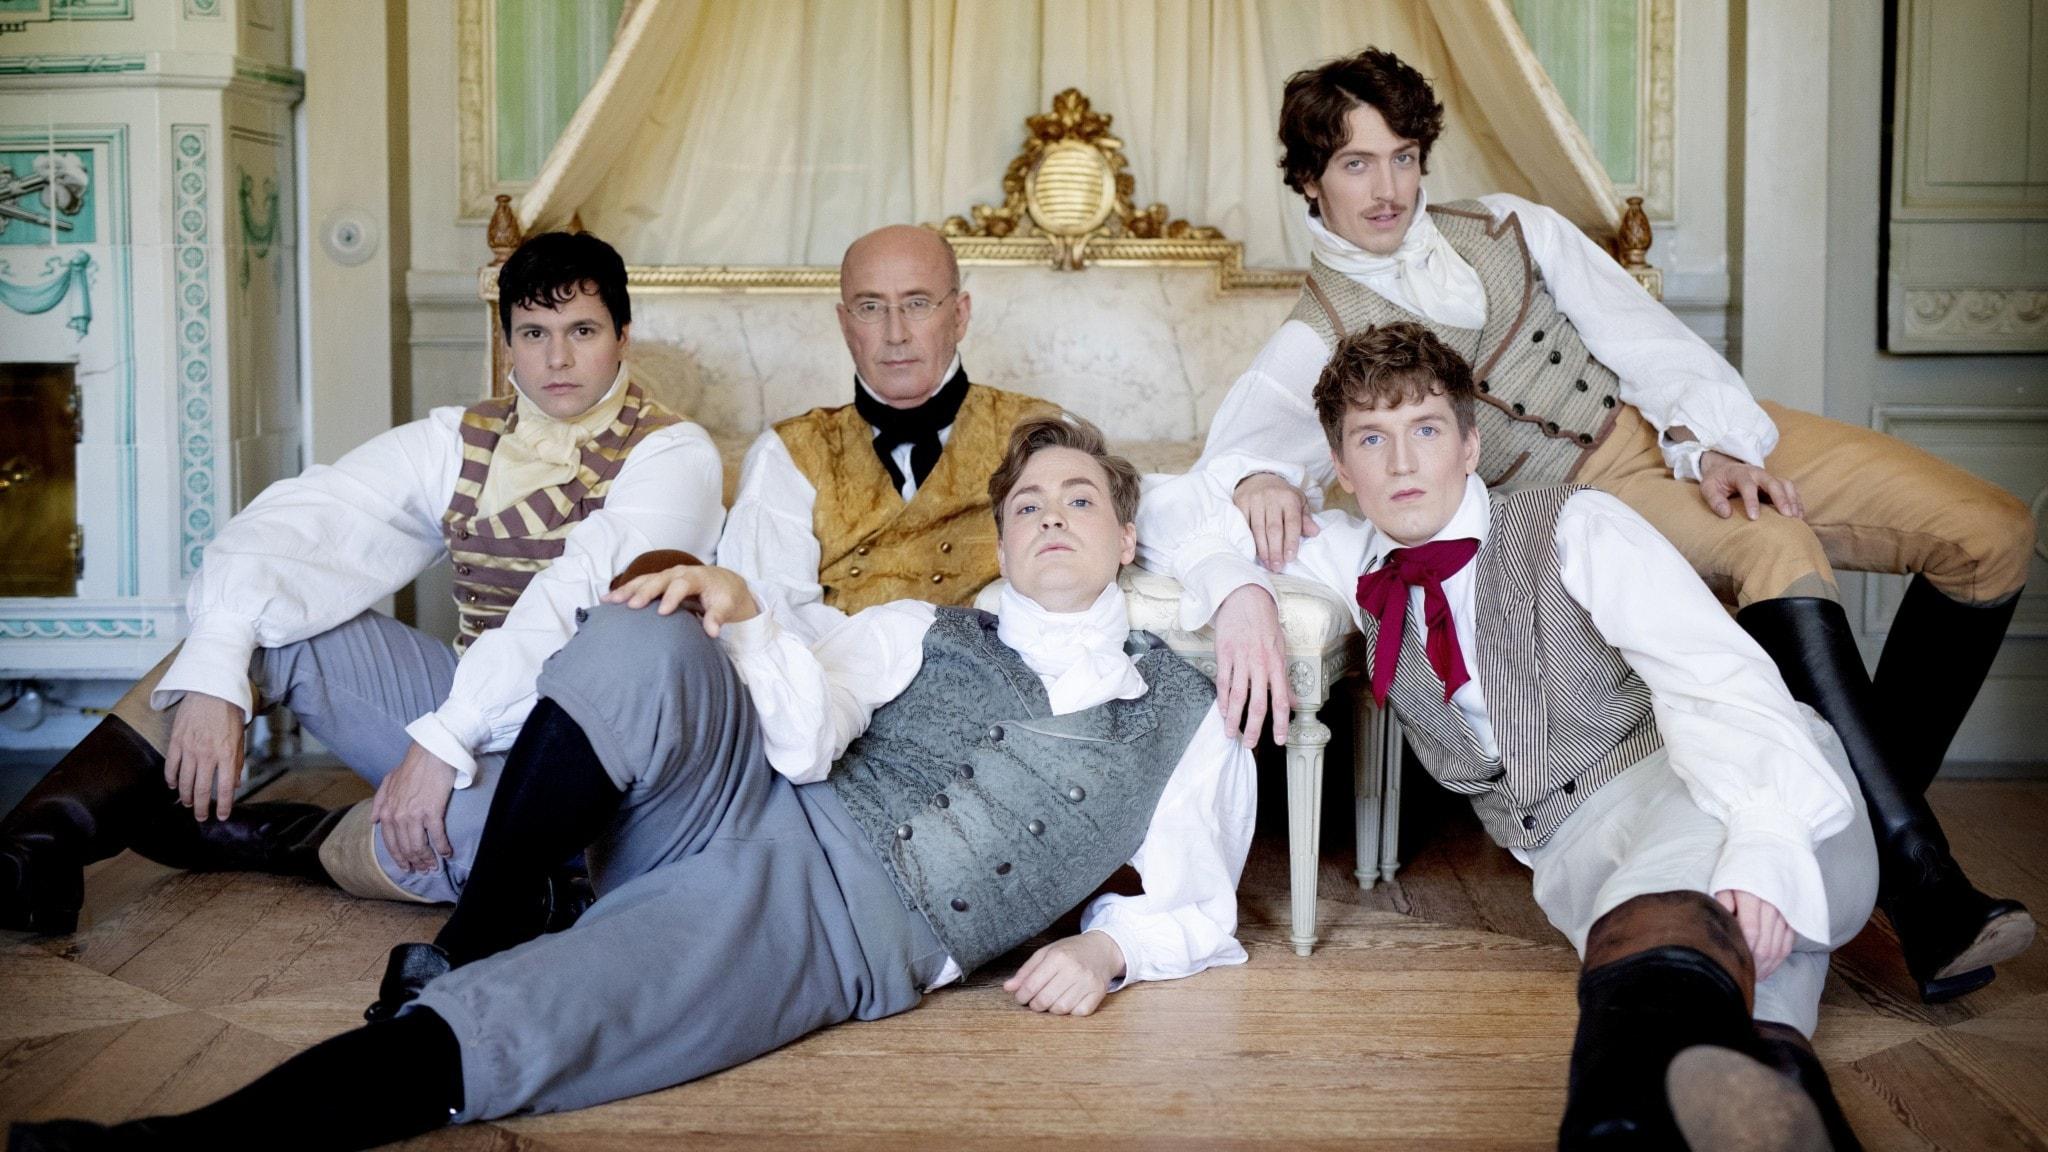 Fem män i 1800tals-kostymer ligger på golvet i en utmanande pose.